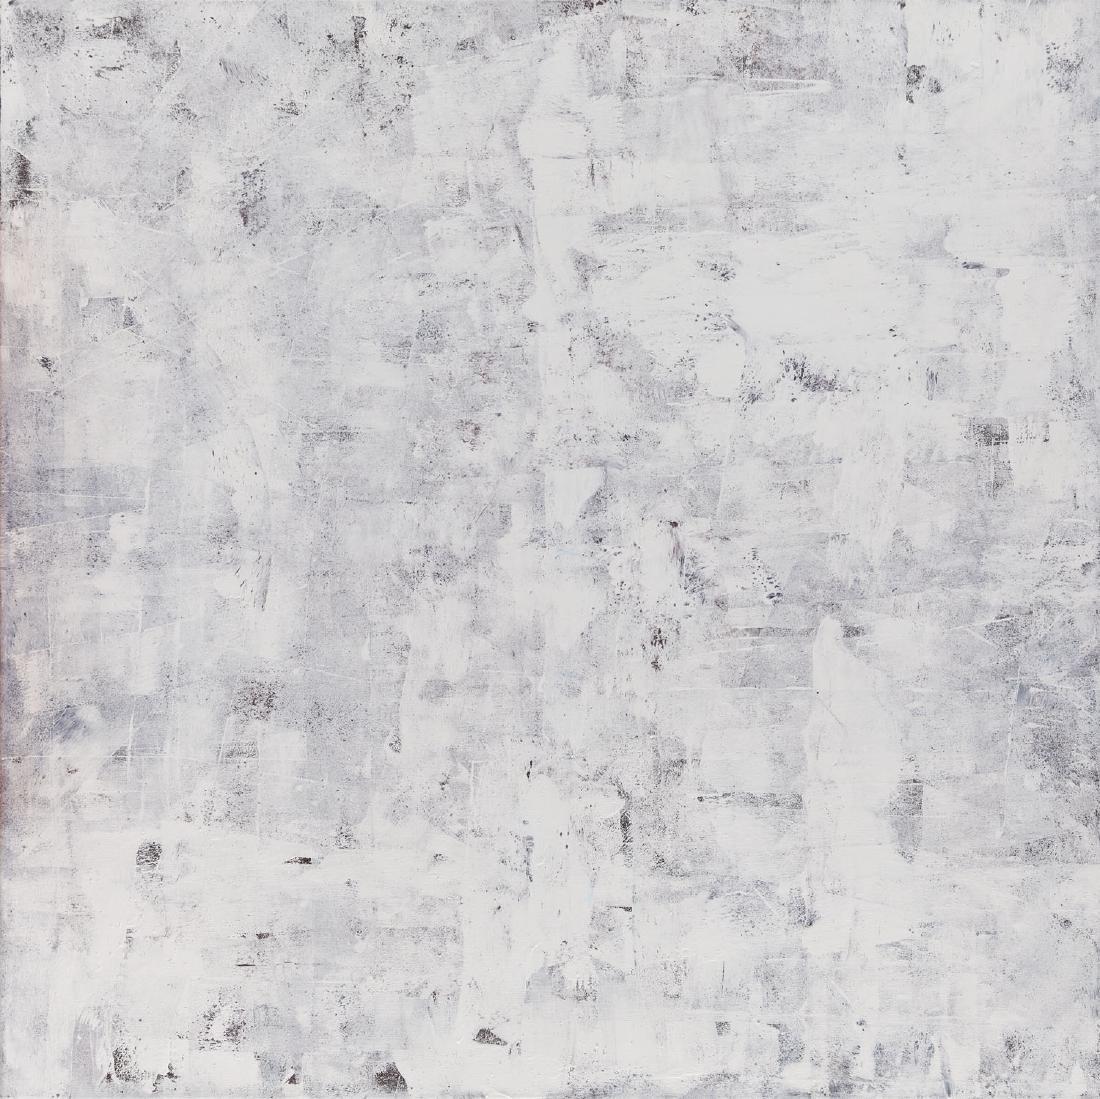 Maria Szeszula (b. 1986), Camposition 2B, 2017